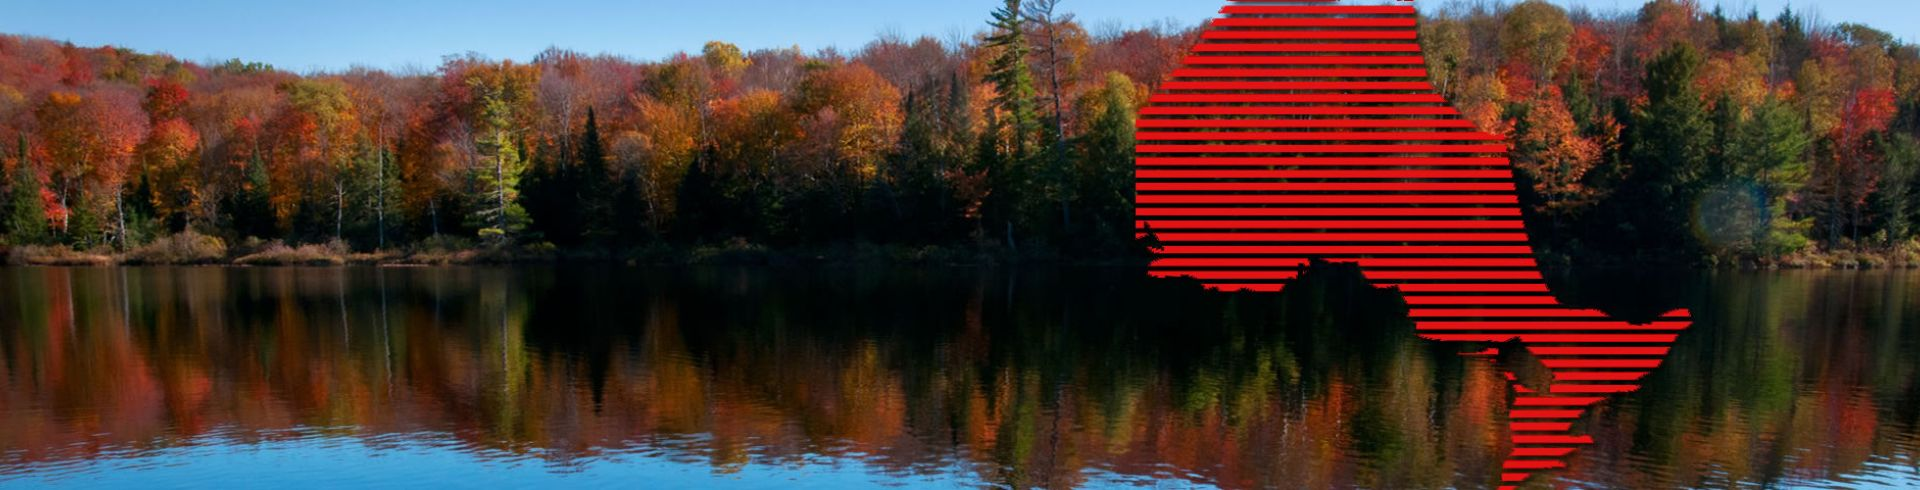 Programs - fall trees and lake